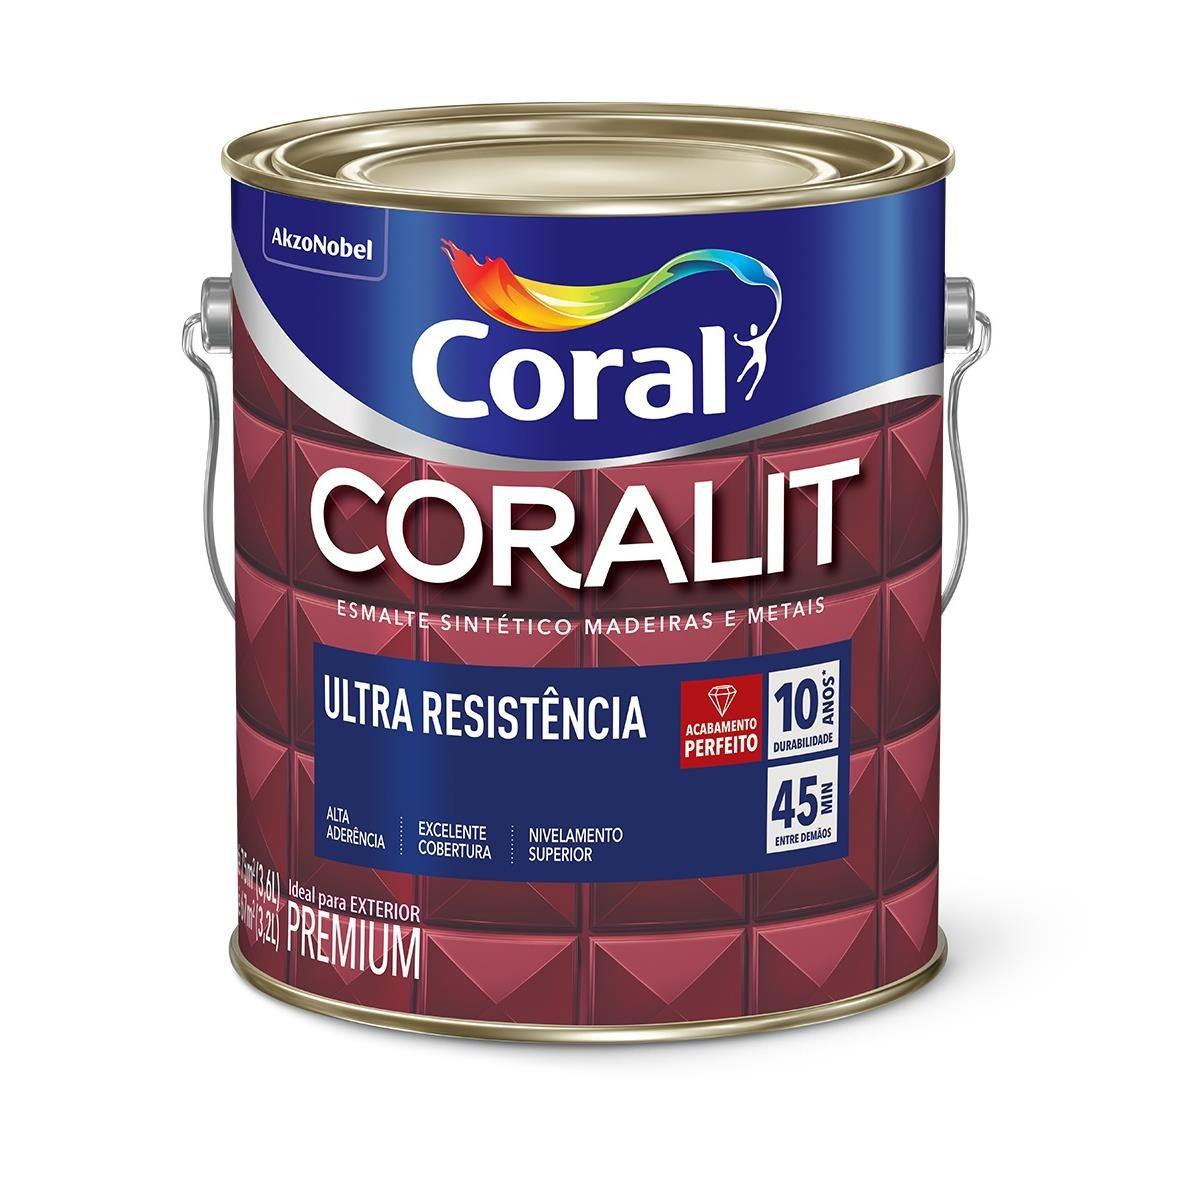 Tinta Esmalte Sintetico Acetinado Premium 36L - Branco Neve - Coralit Coral